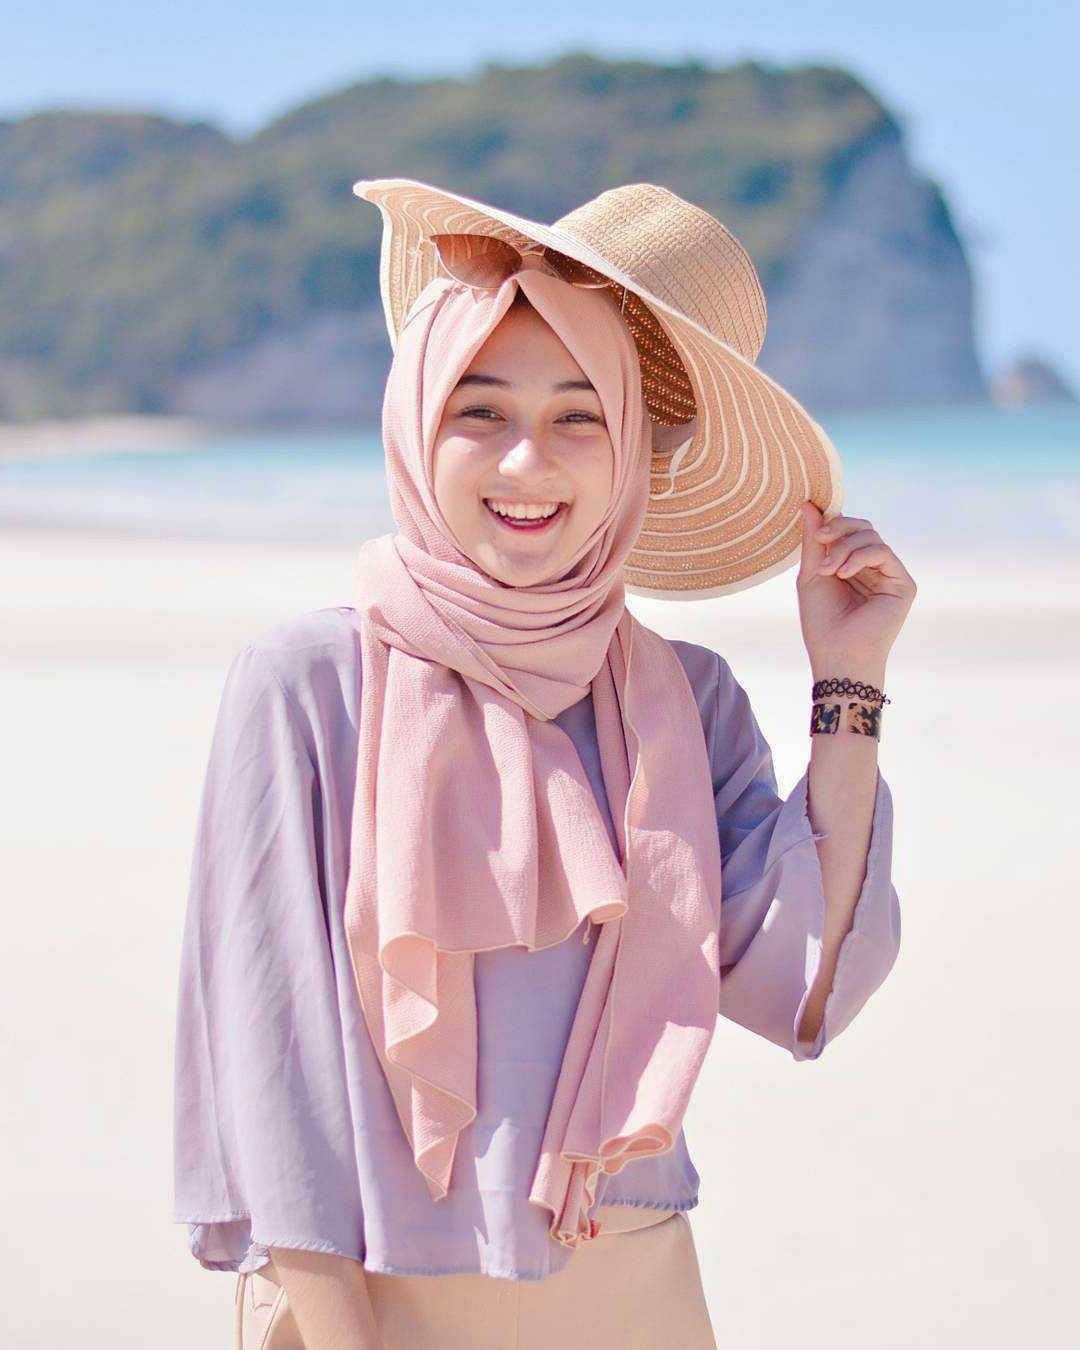 Ide Baju Lebaran Casual 2018 X8d1 18 Trend Model Baju Hijab 2018 Terbaru Desain Casual & Modern